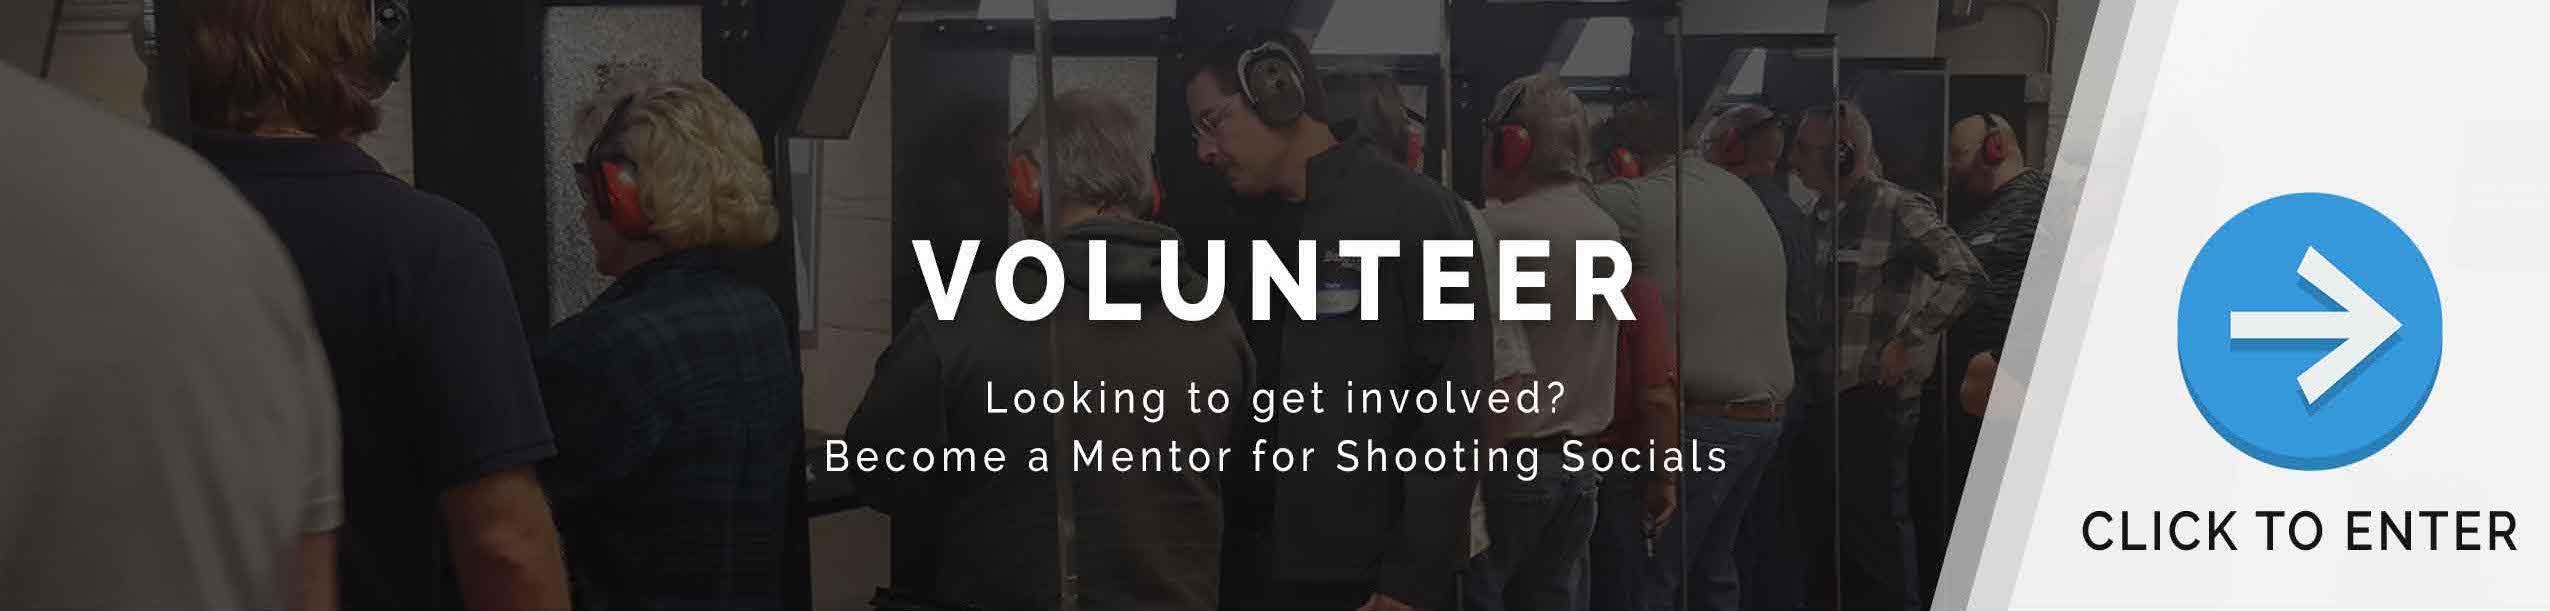 Volunteer_3